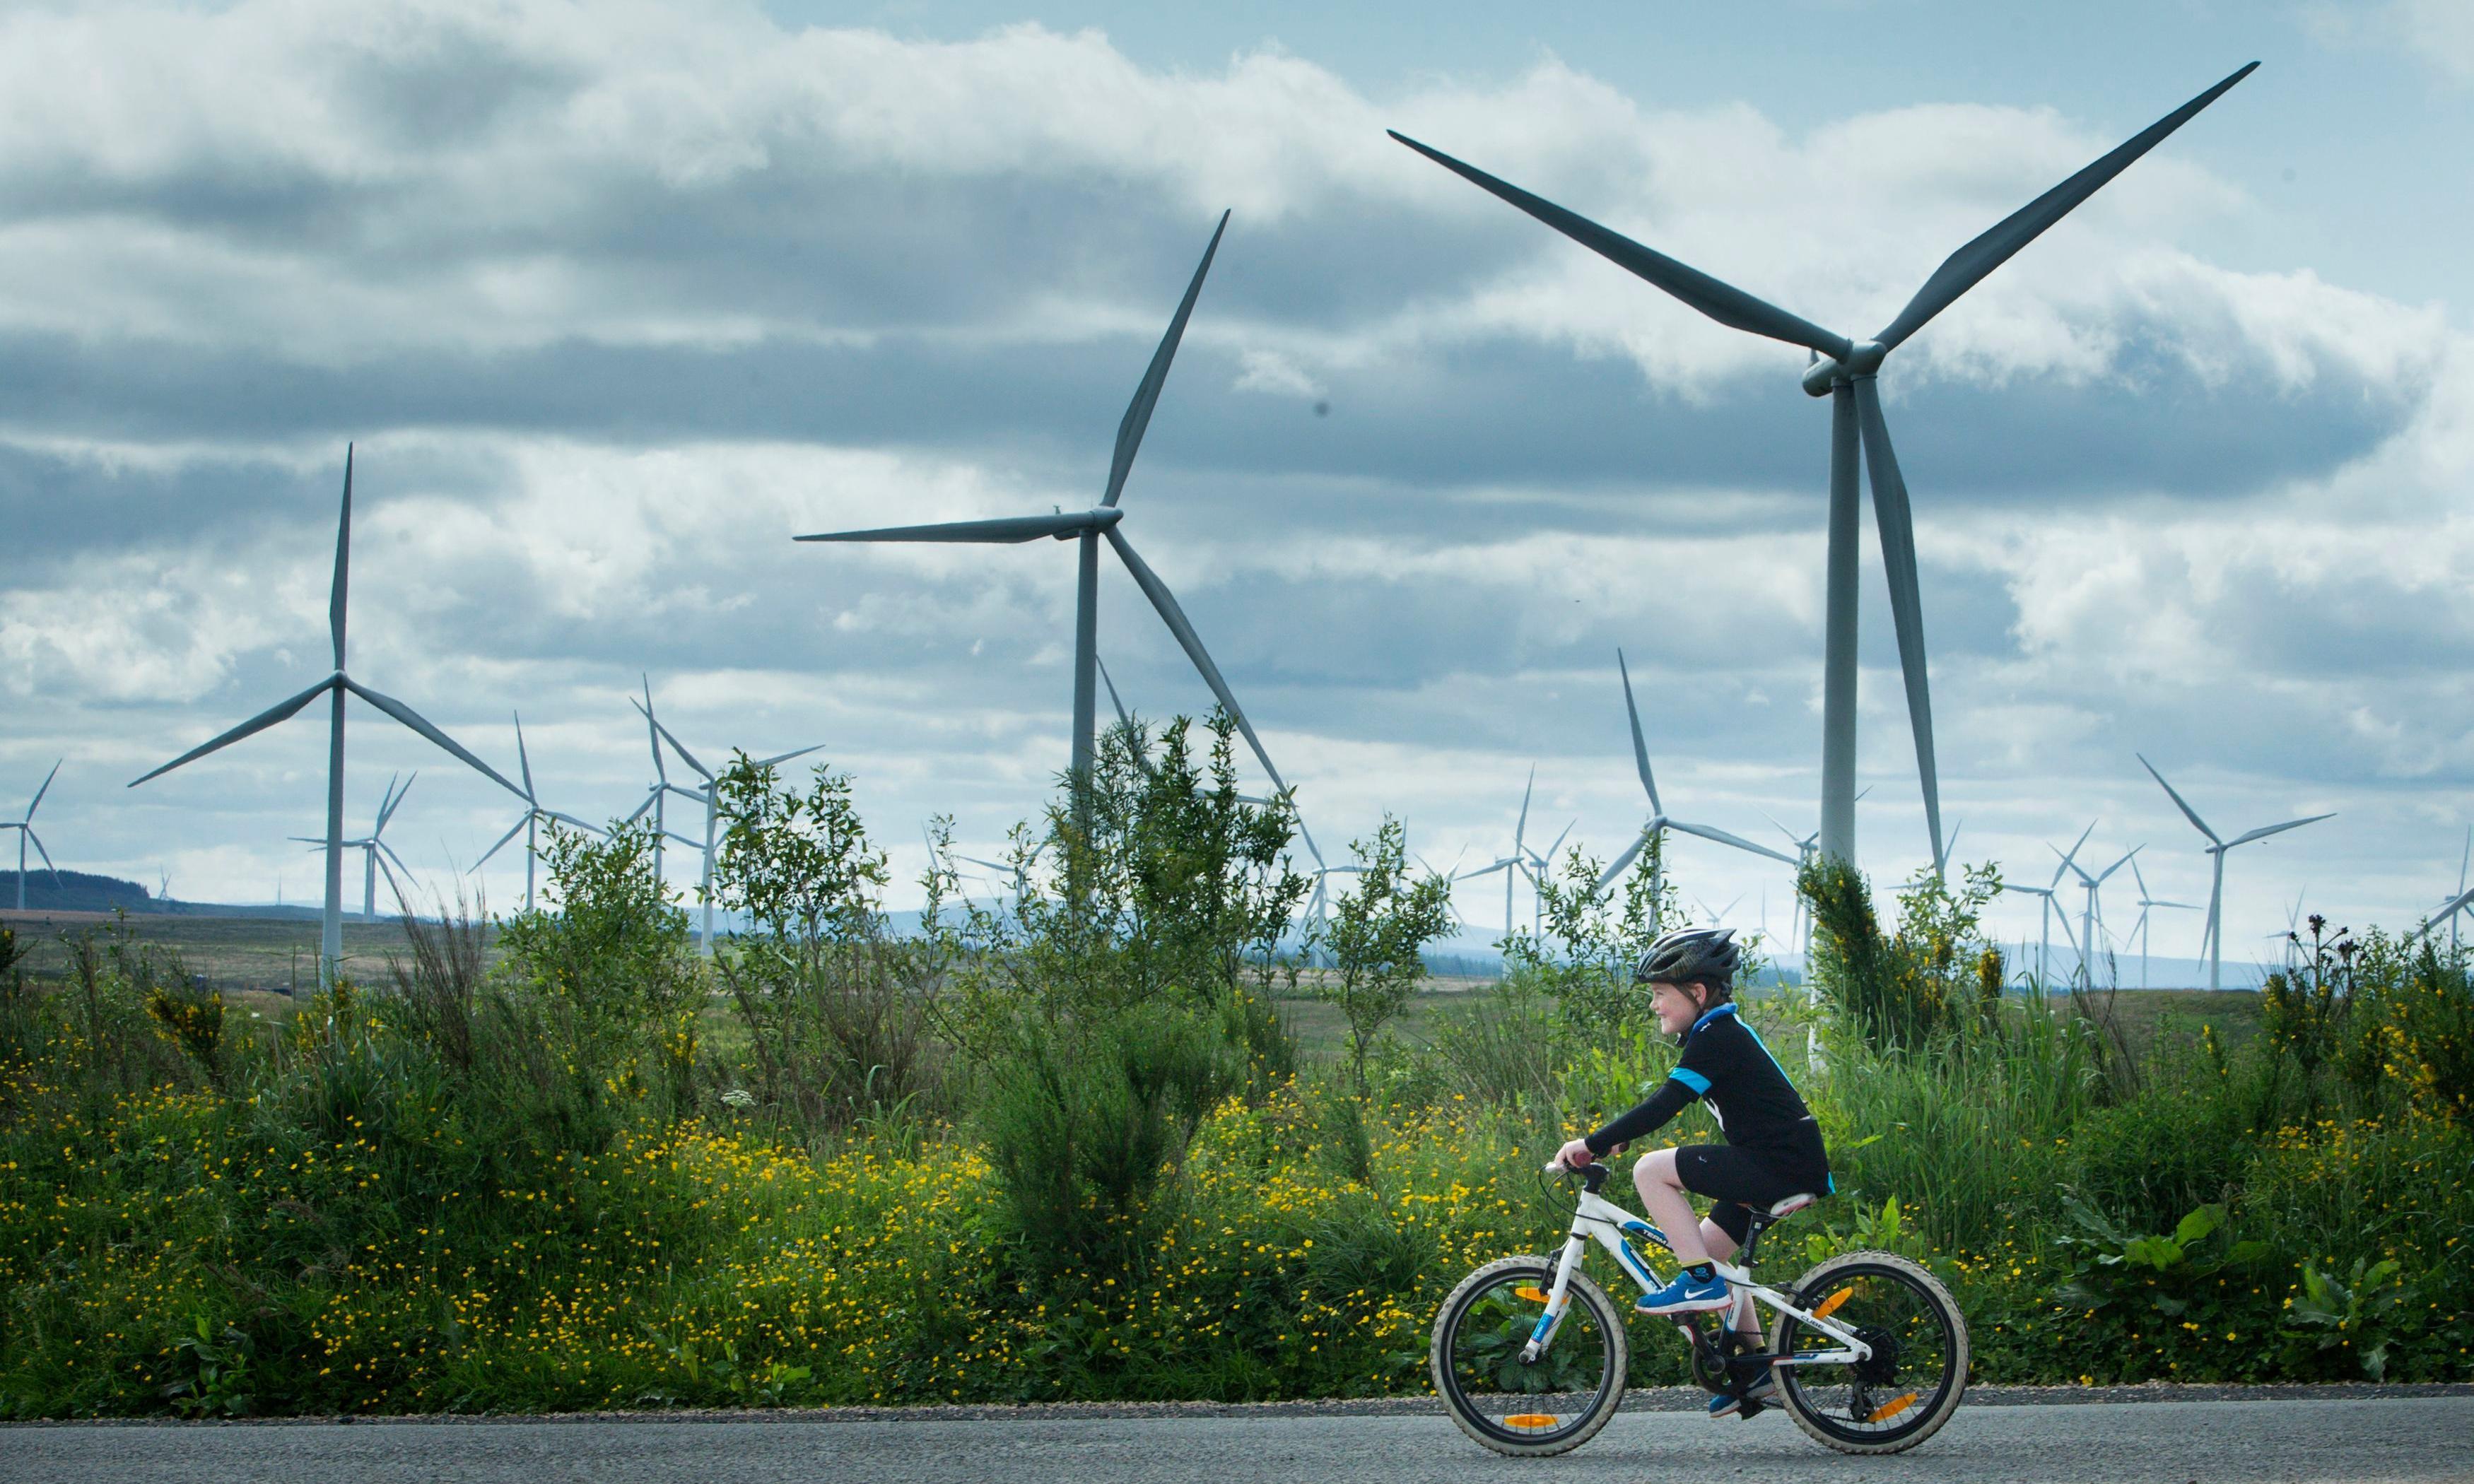 Scottish Power plans to build solar panels beside windfarms